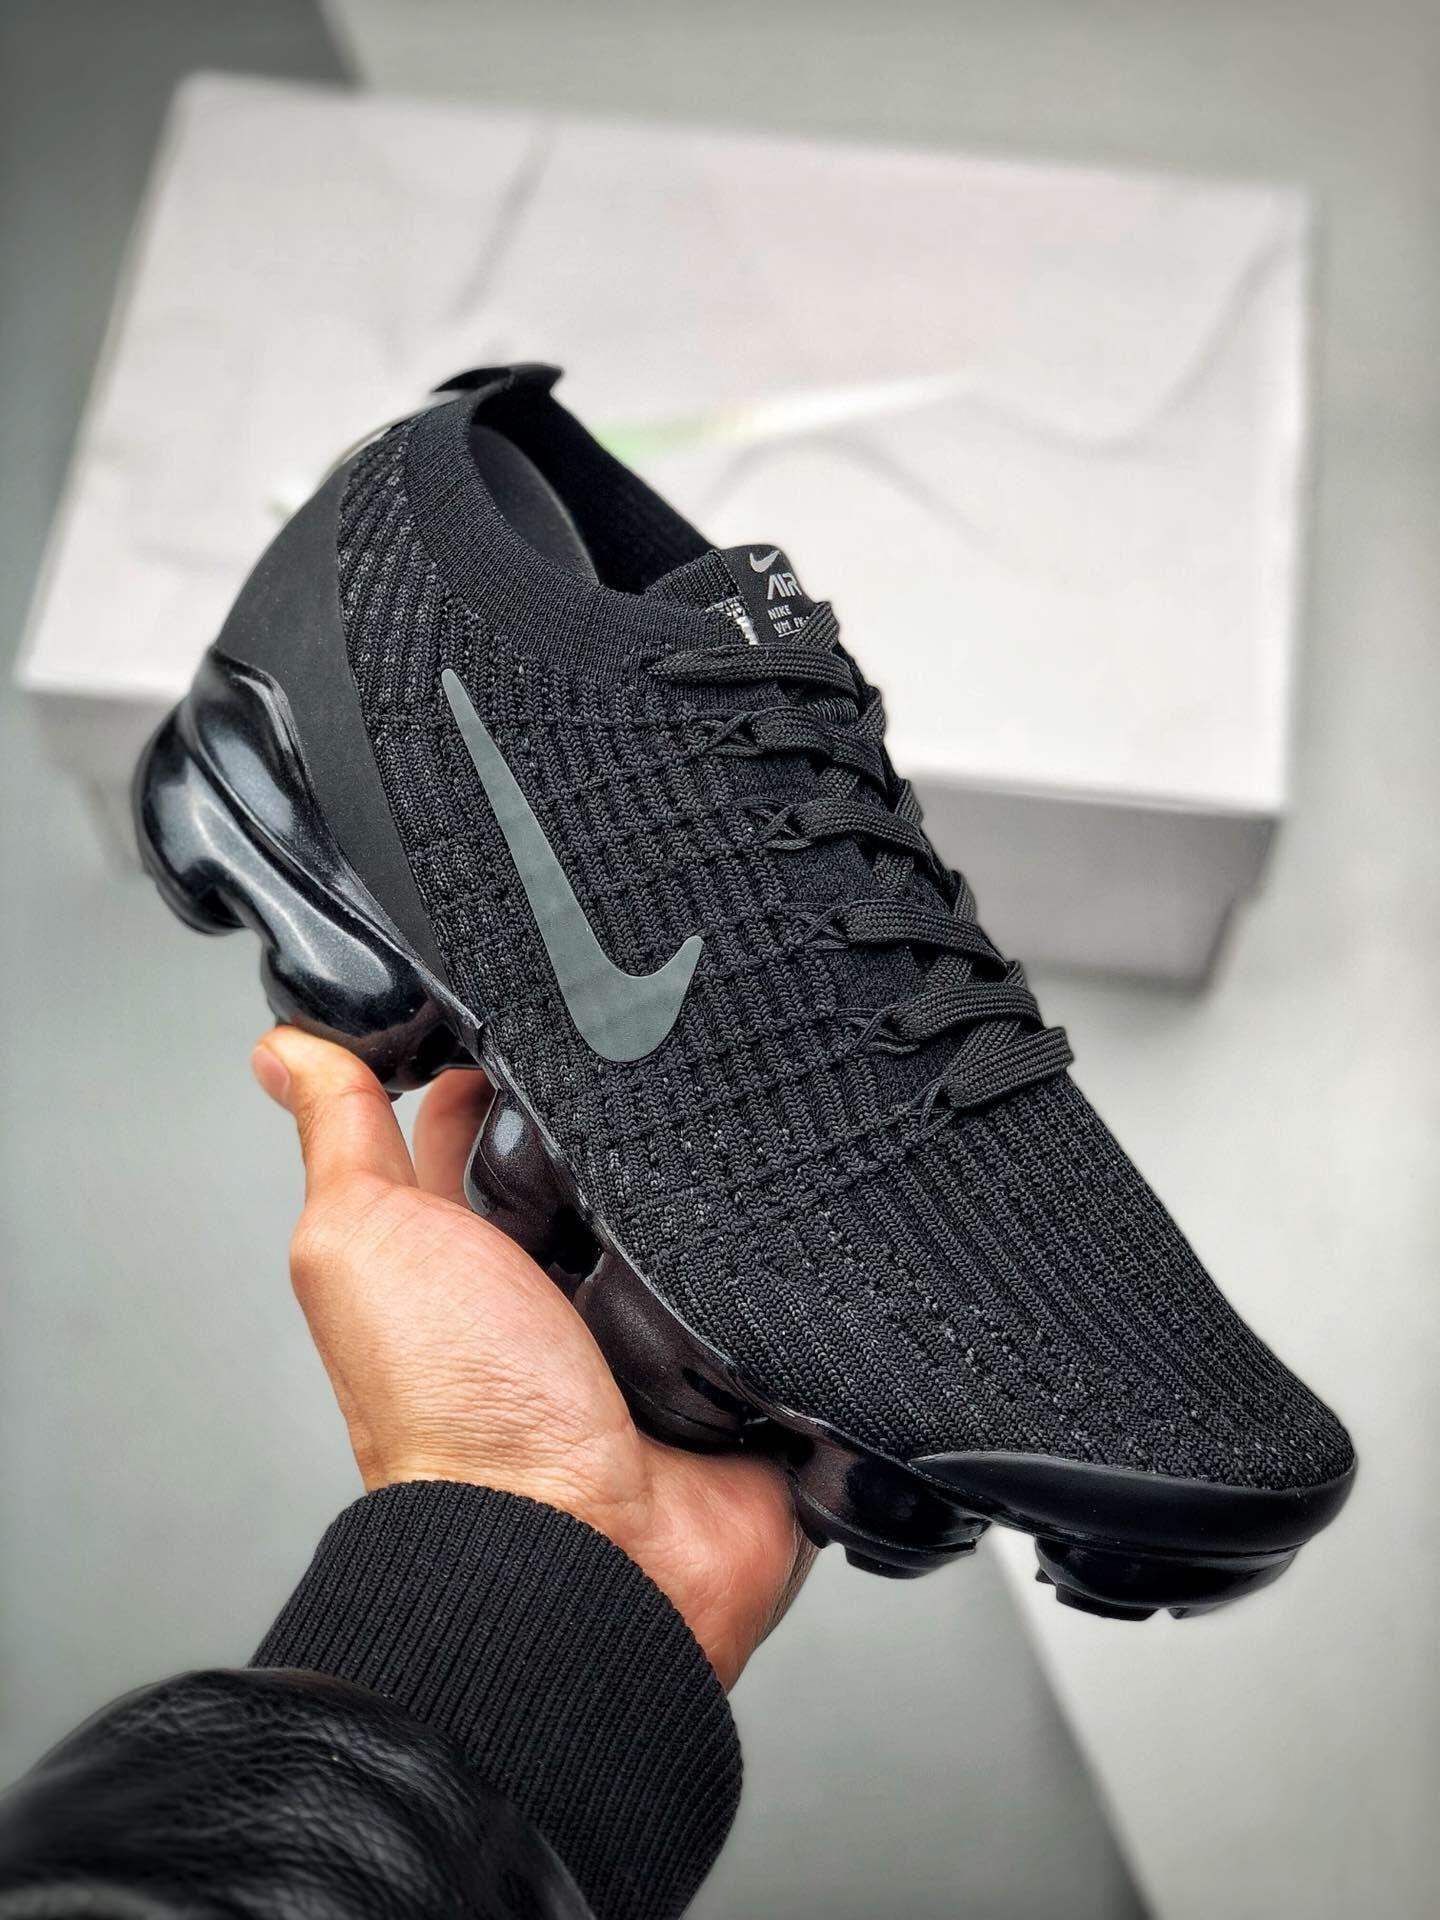 size 40 14309 7c923 NIKE AIR VAPORMAX FLYKNIT 2.0 942843-003   又拍图片管家  Nike Vapormax Flykint    Sneakers nike、Sneakers 和Nike